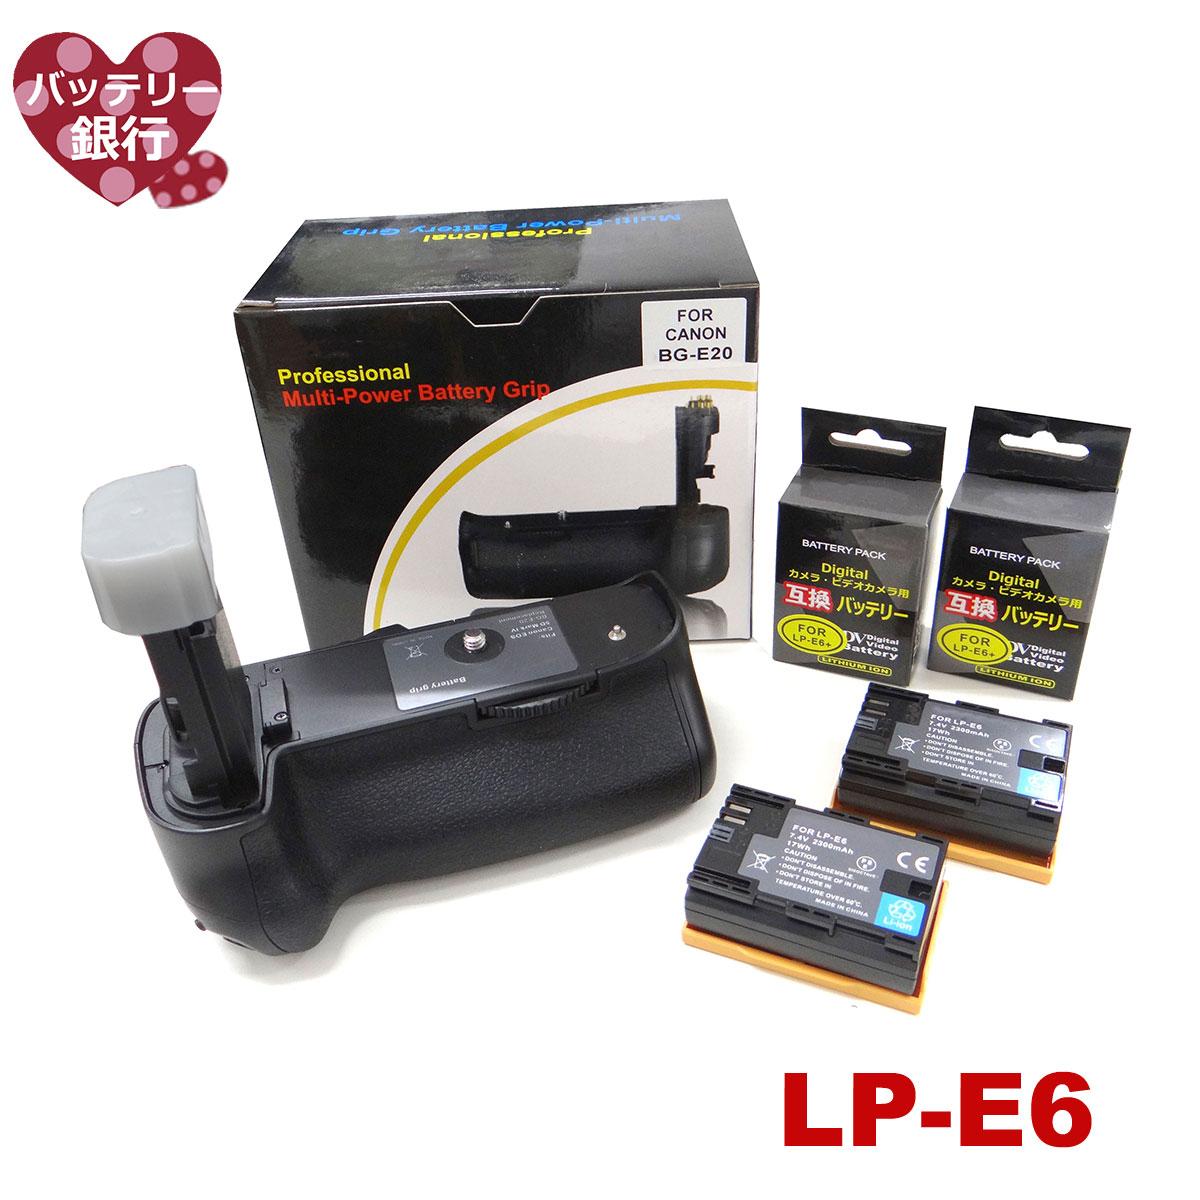 【】BG-E20  送料無料キヤノン CANON バッテリー2個とバッテリーグリップの3点セット純正互換品 LP-E6 / LP-E6N / EOS 5D Mark IV カメラ専用 BG-E20